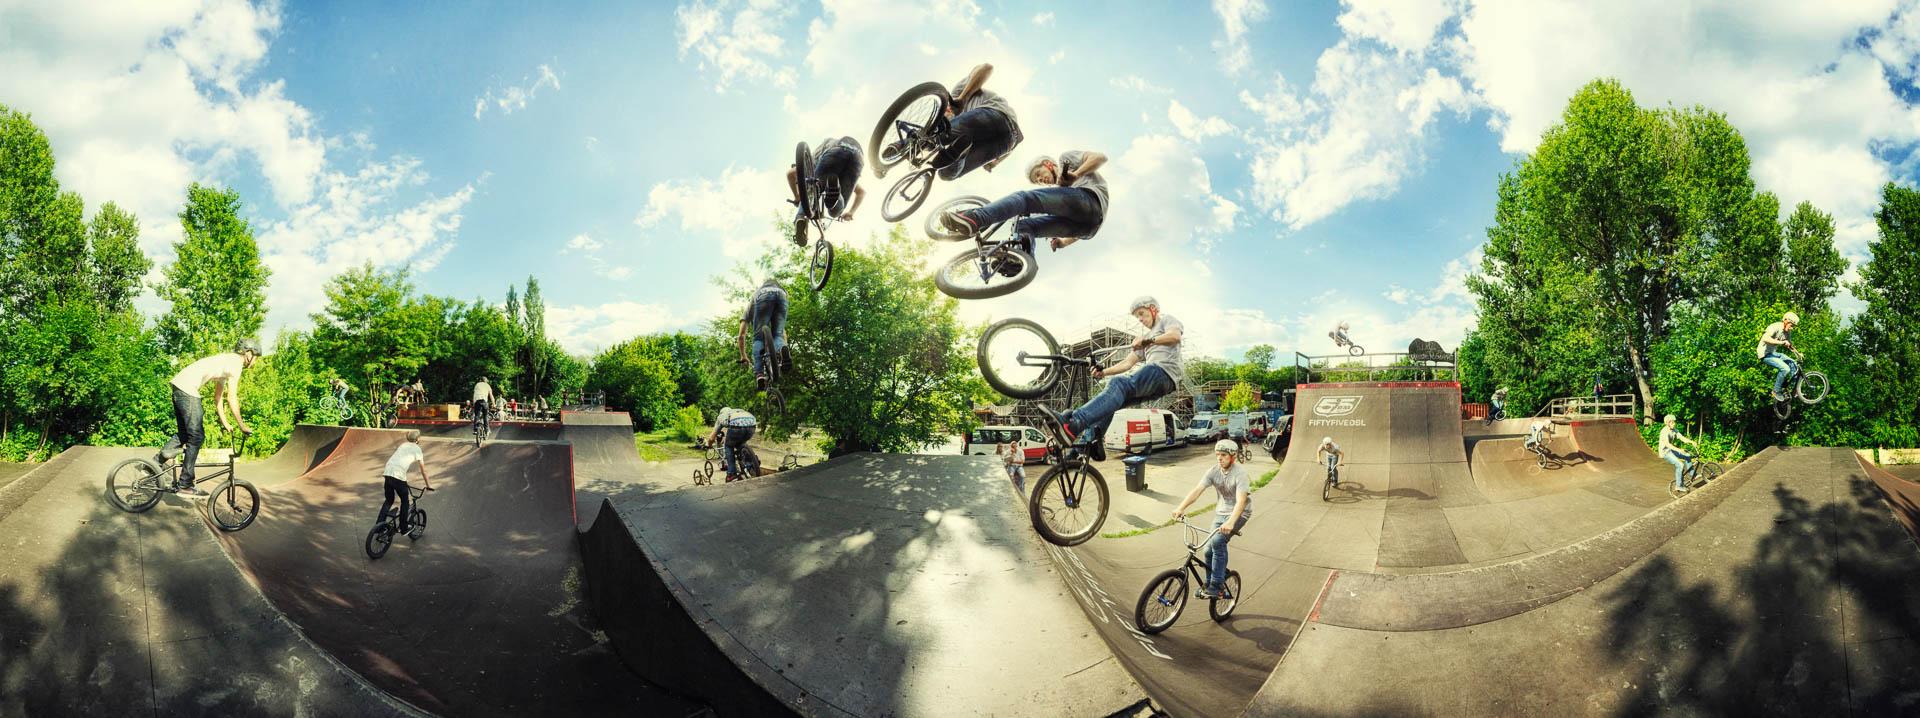 BMX Mellowpark by Tobi Bohn Panorama 360 Fotograf